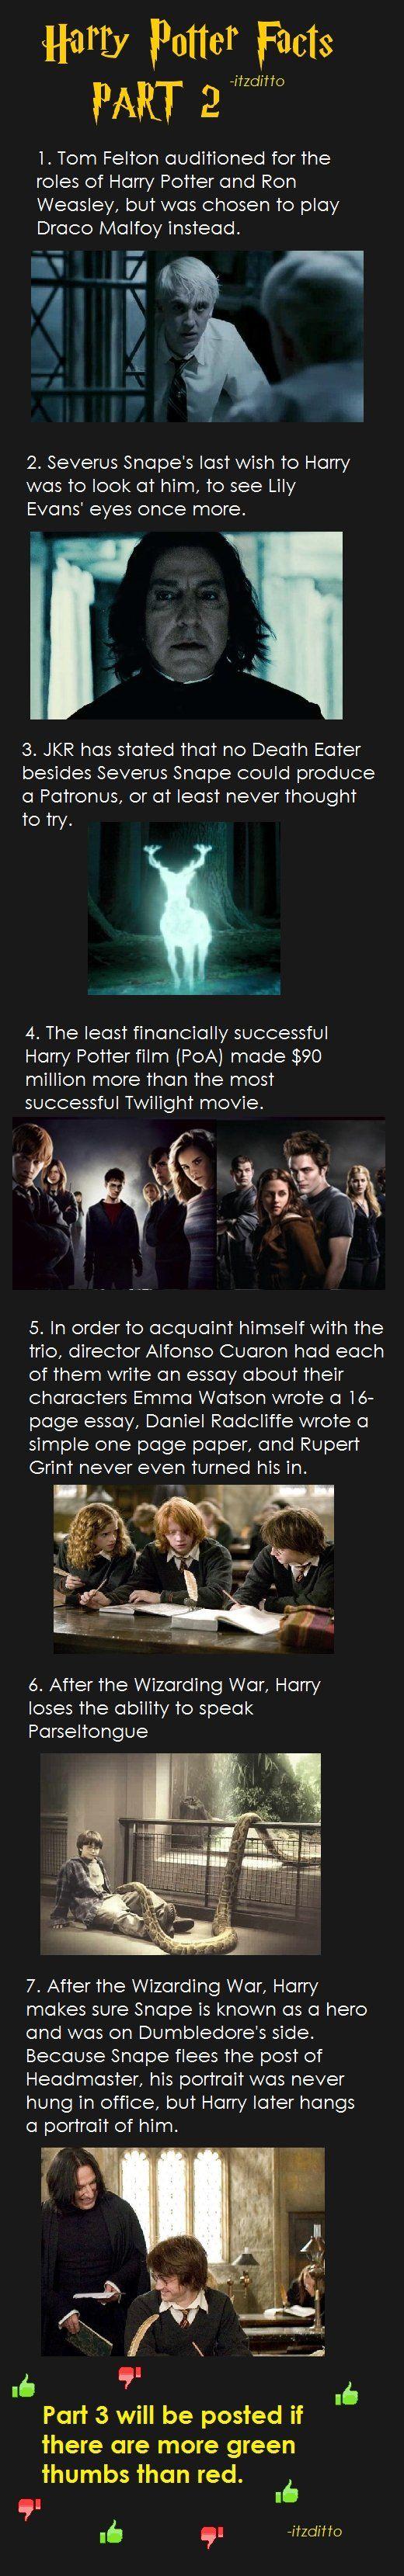 Harry Potter Facts Part 2. Part 5: funnyjunk.com/funny_pictures/2403904/Harry+Potter+Facts+Part+5/ Part 4: funnyjunk.com/funny_pictures/2399572/Harry+Potter+Fac